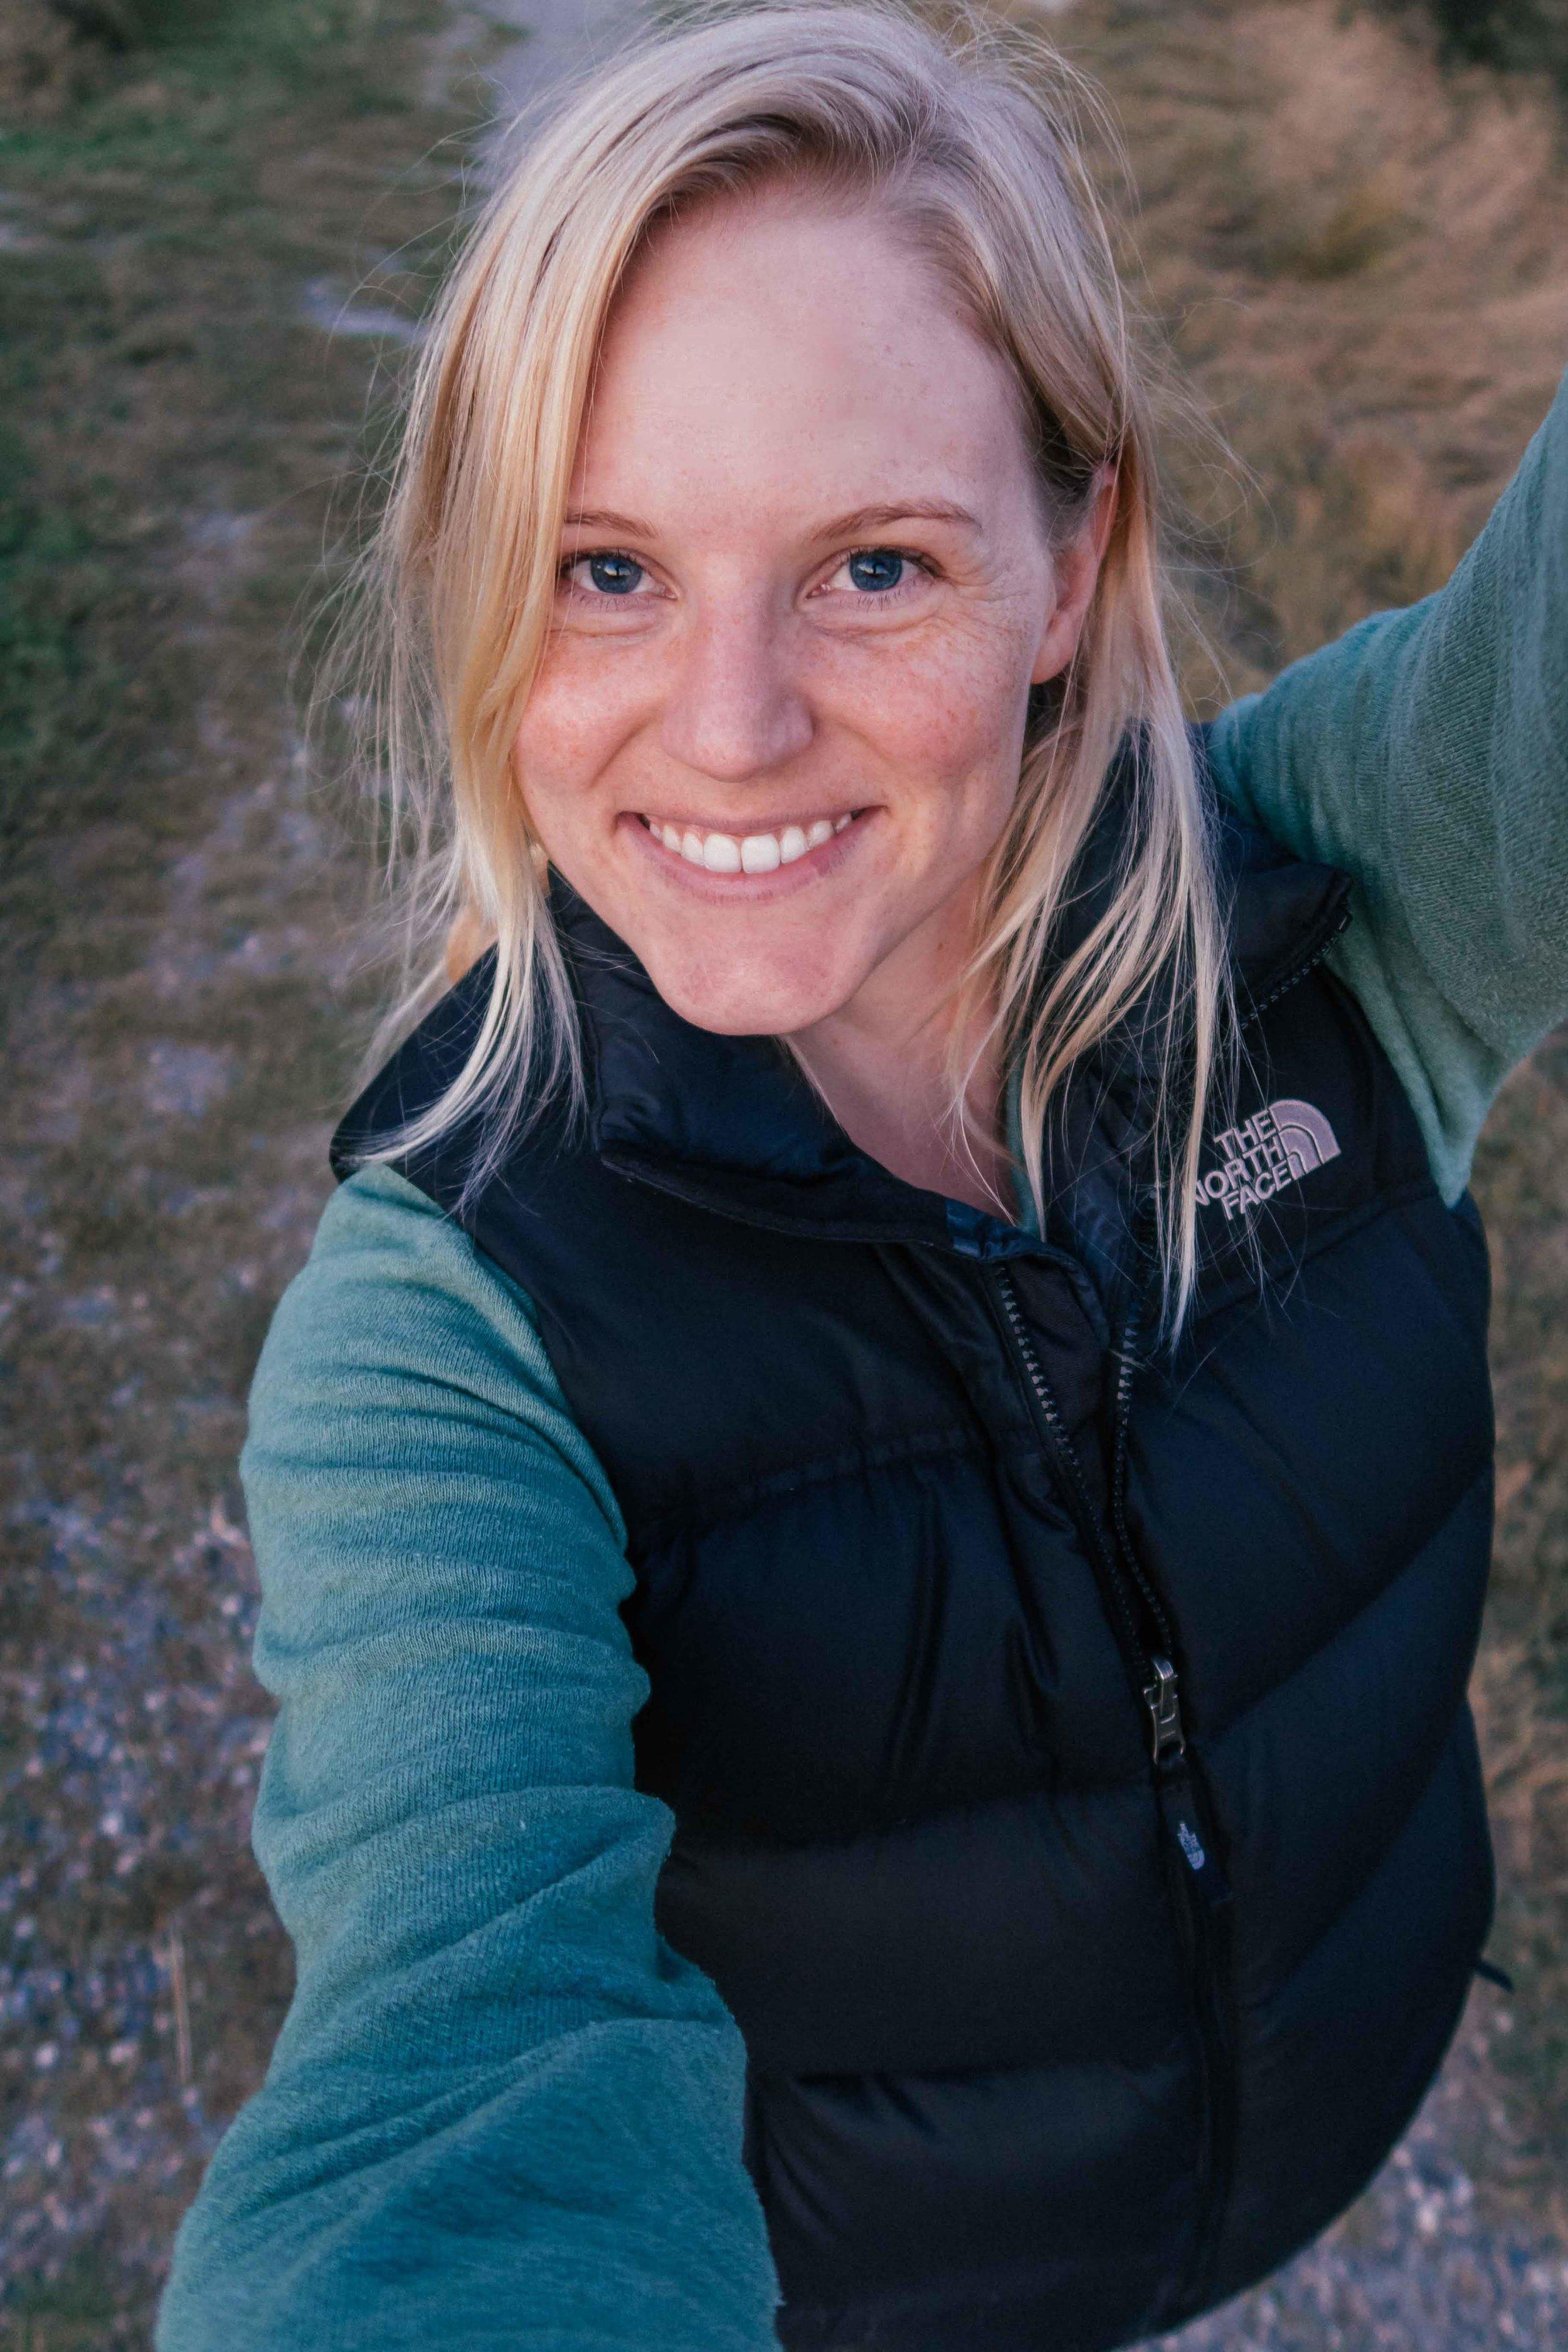 Blogger Bri Sul hiking around Montana. Super cute North Face jacket.